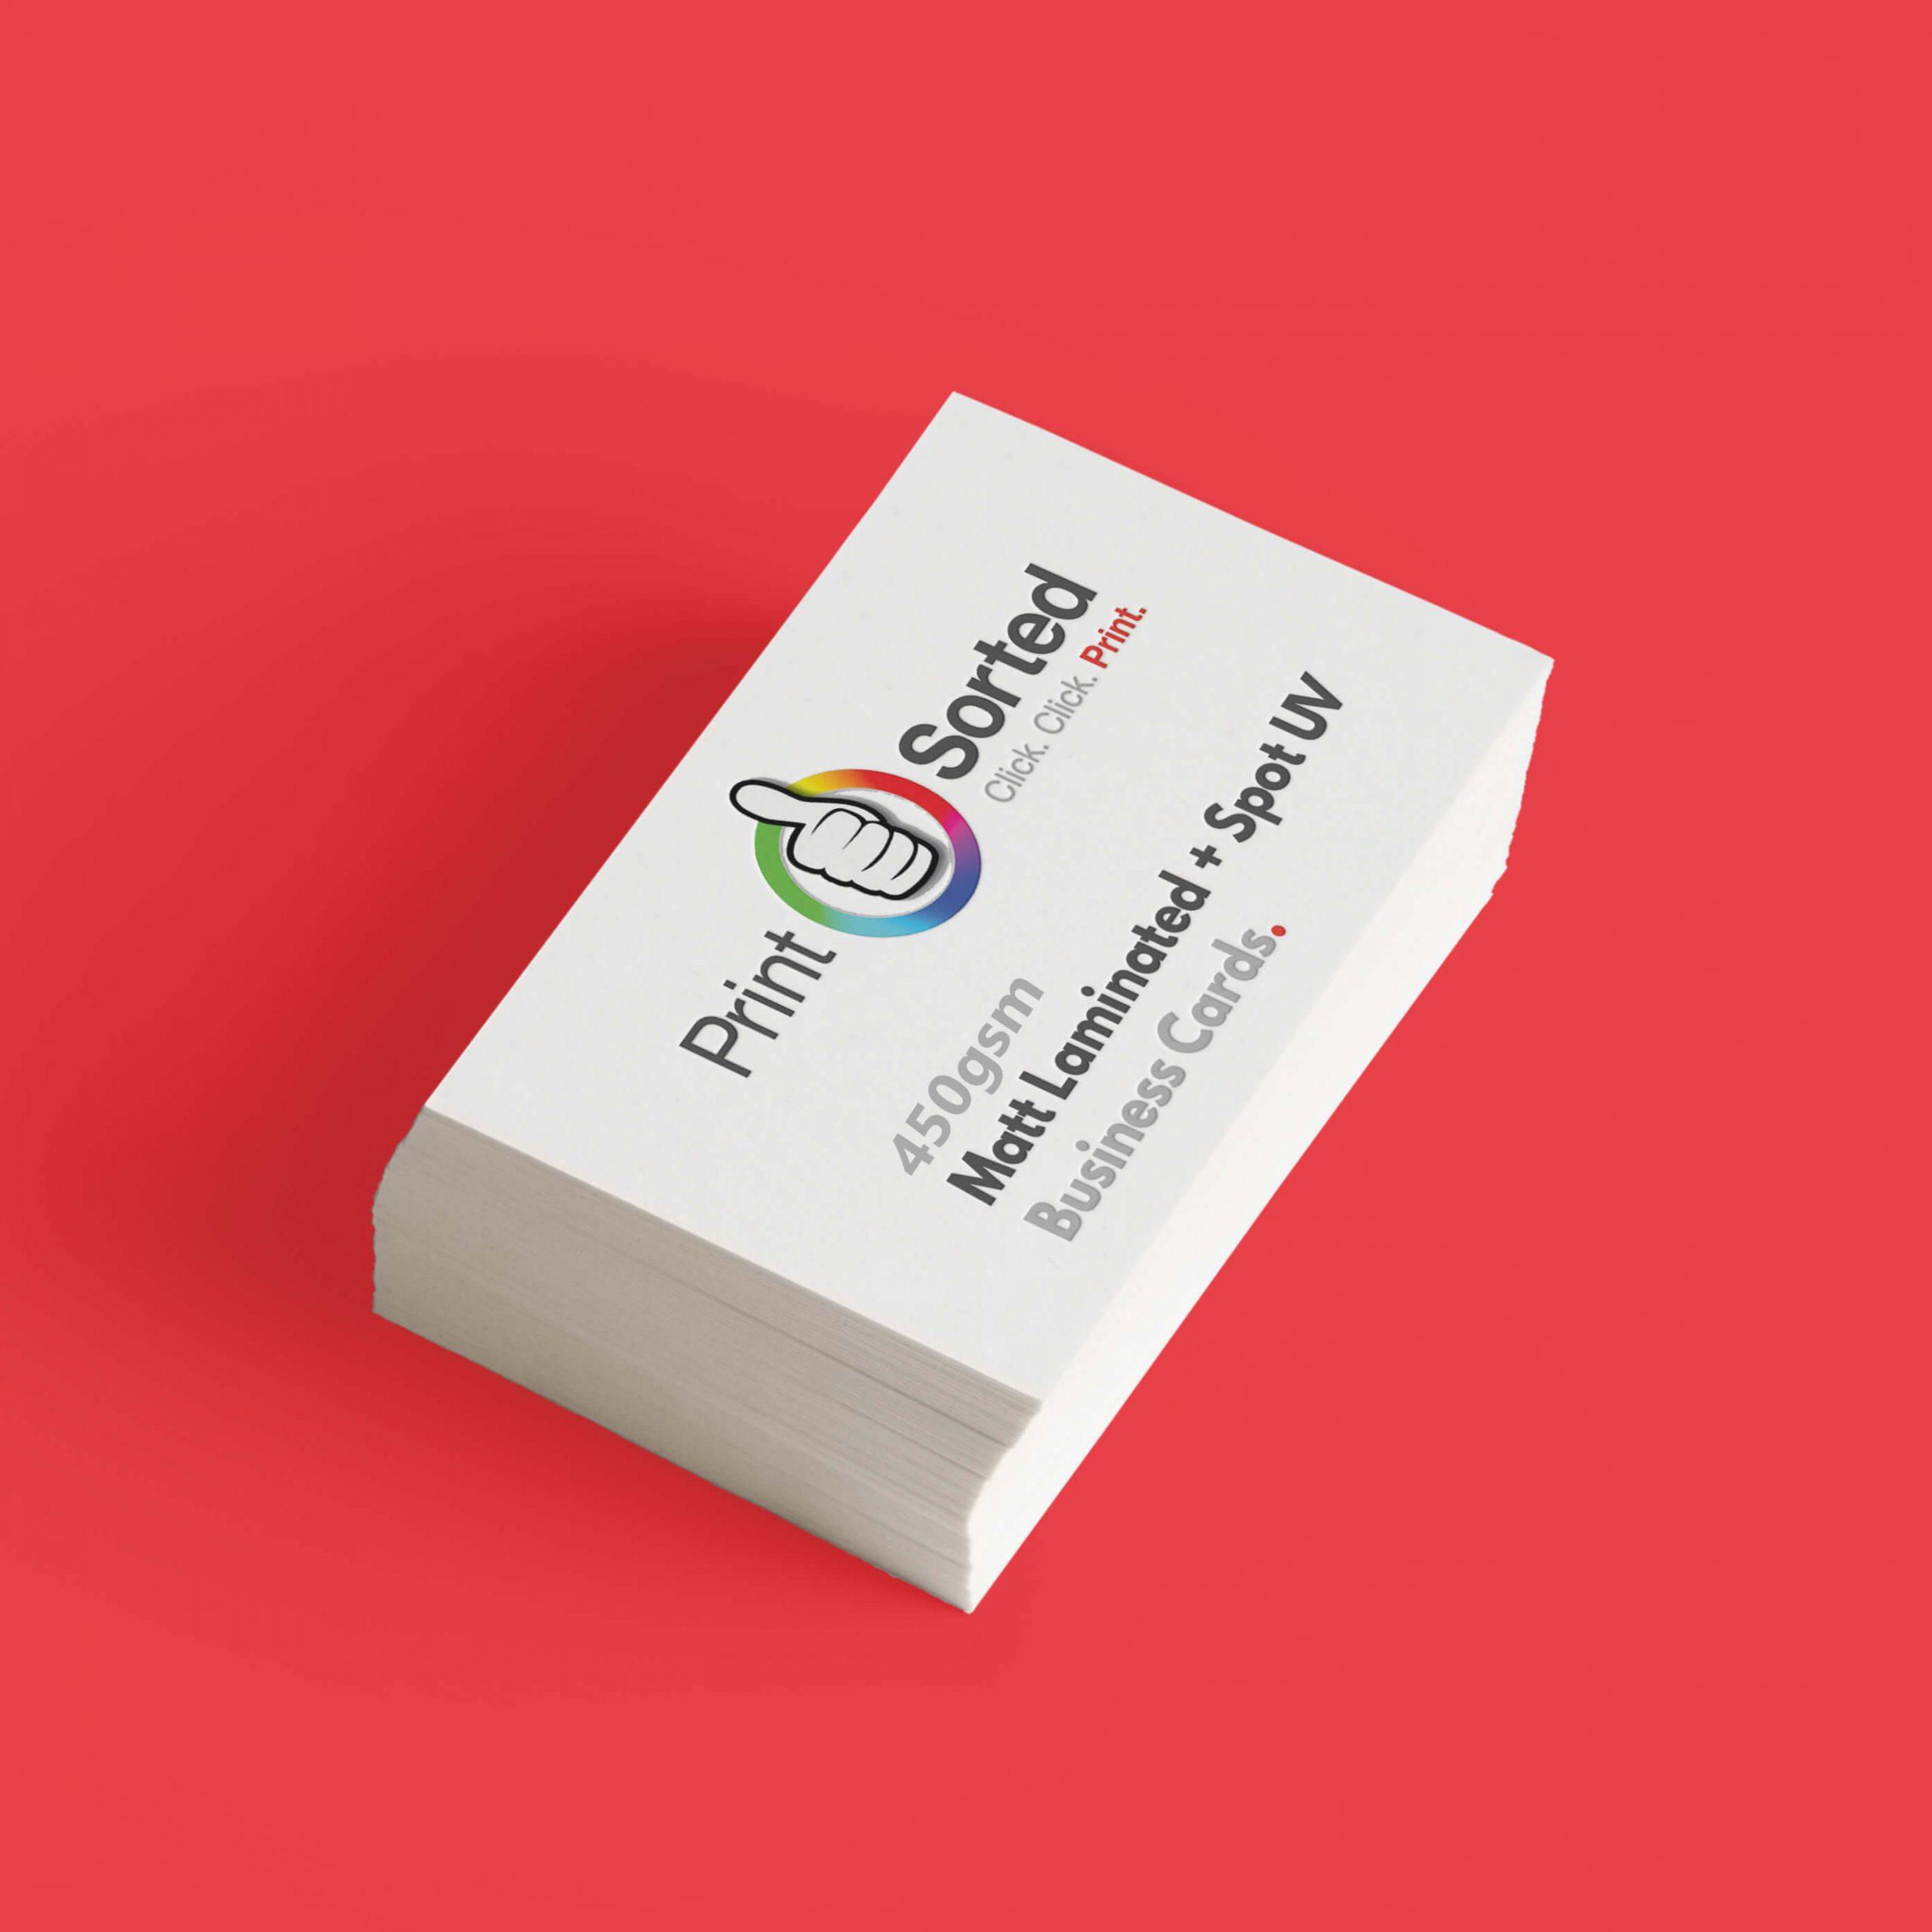 450gsm Spot UV Matt Laminated Business Cards